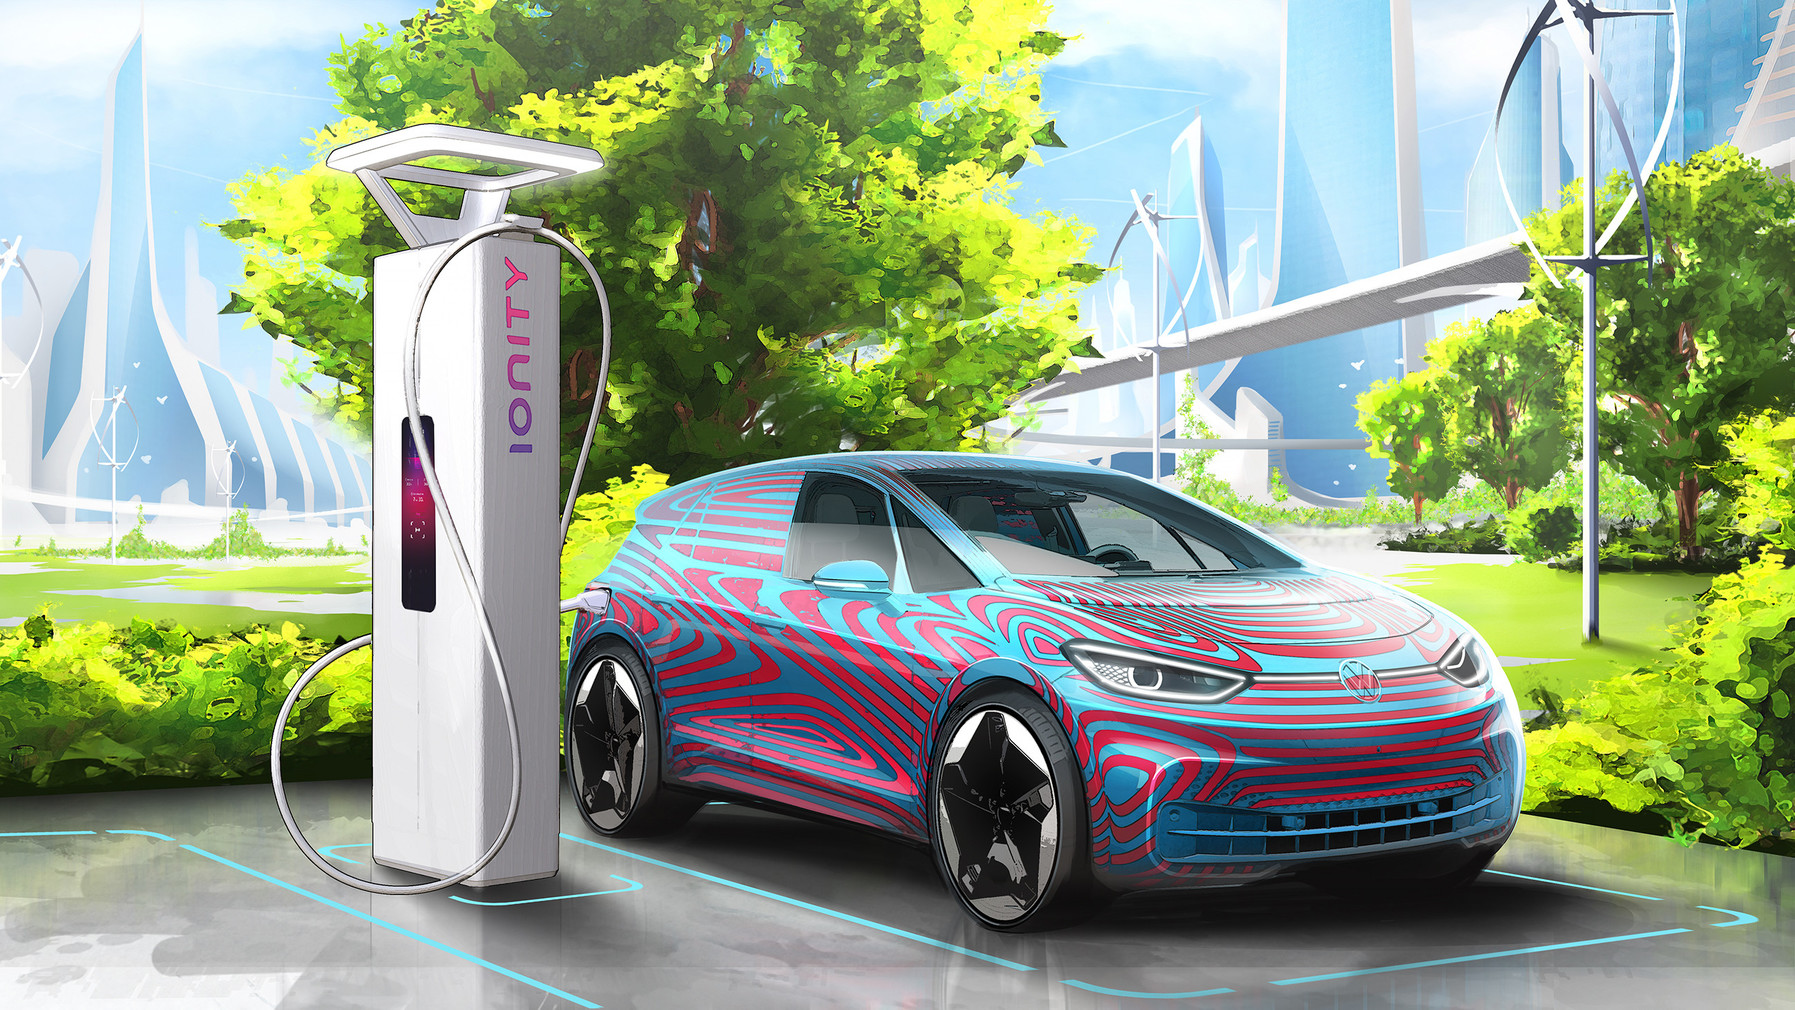 Id3 Volkswagen Ionity E-Mobilität